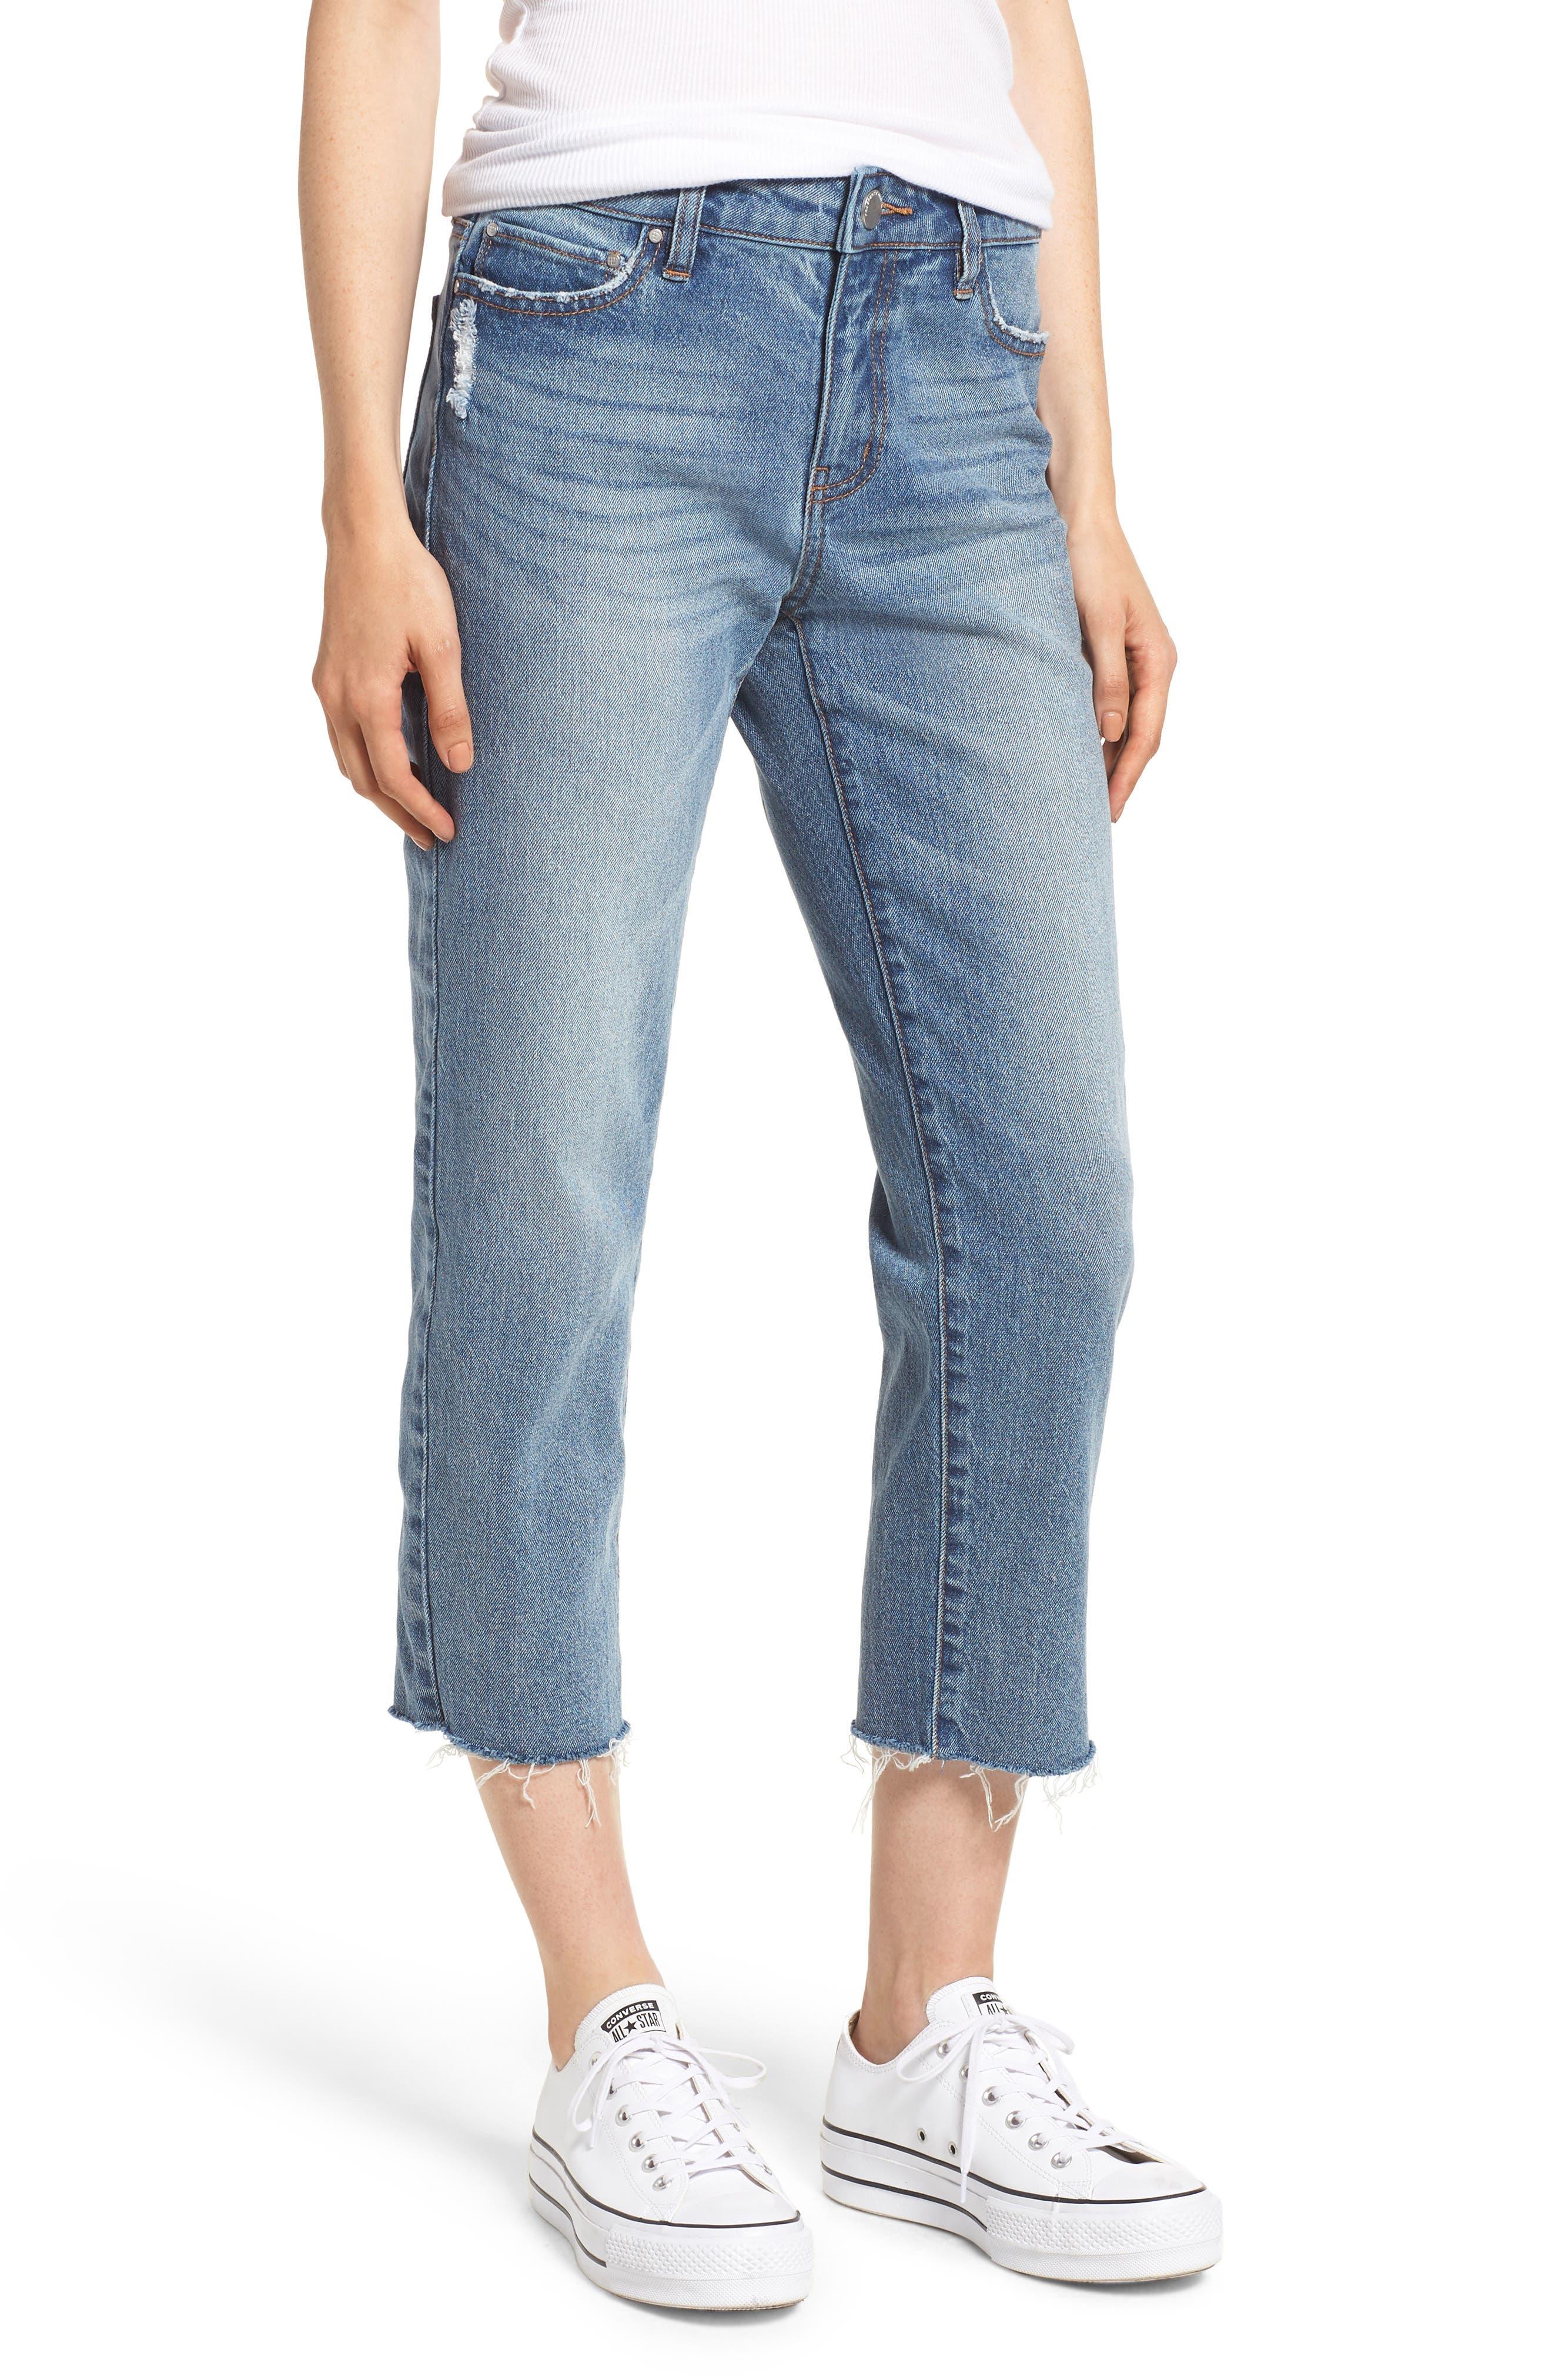 PROSPERITY DENIM, Crop Straight Leg Jeans, Main thumbnail 1, color, MED WASH